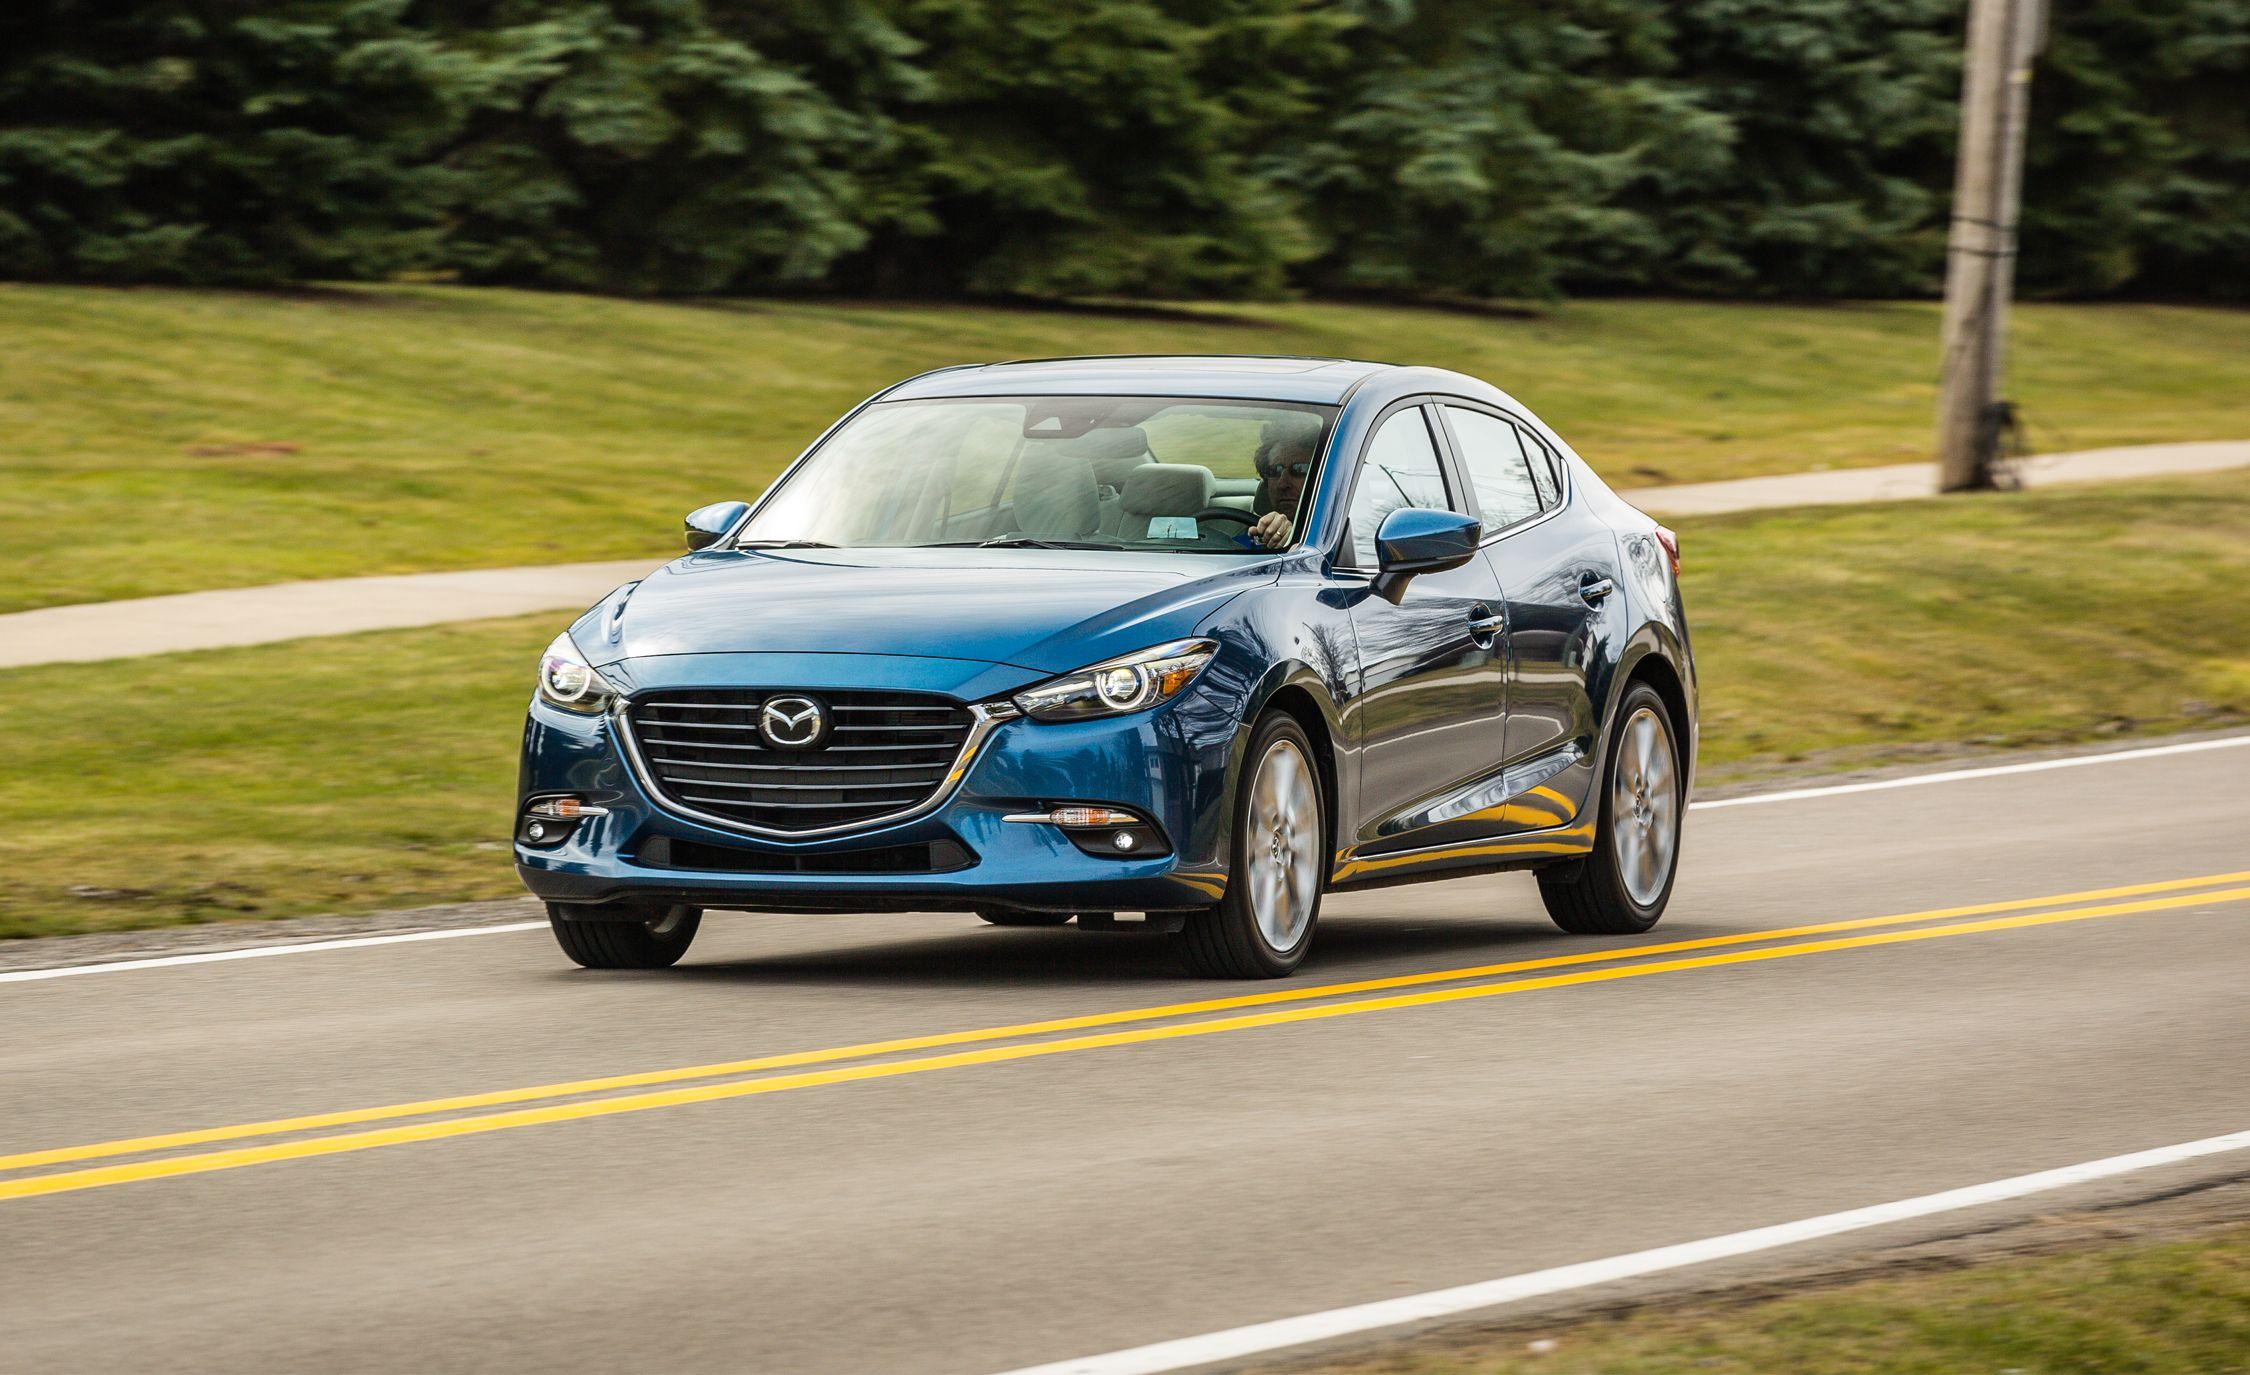 2017 mazda 3 2 5l automatic sedan tested review car and driver rh caranddriver com Ford V6 Engine Diagram 2003 Mazda 6 Engine Diagram